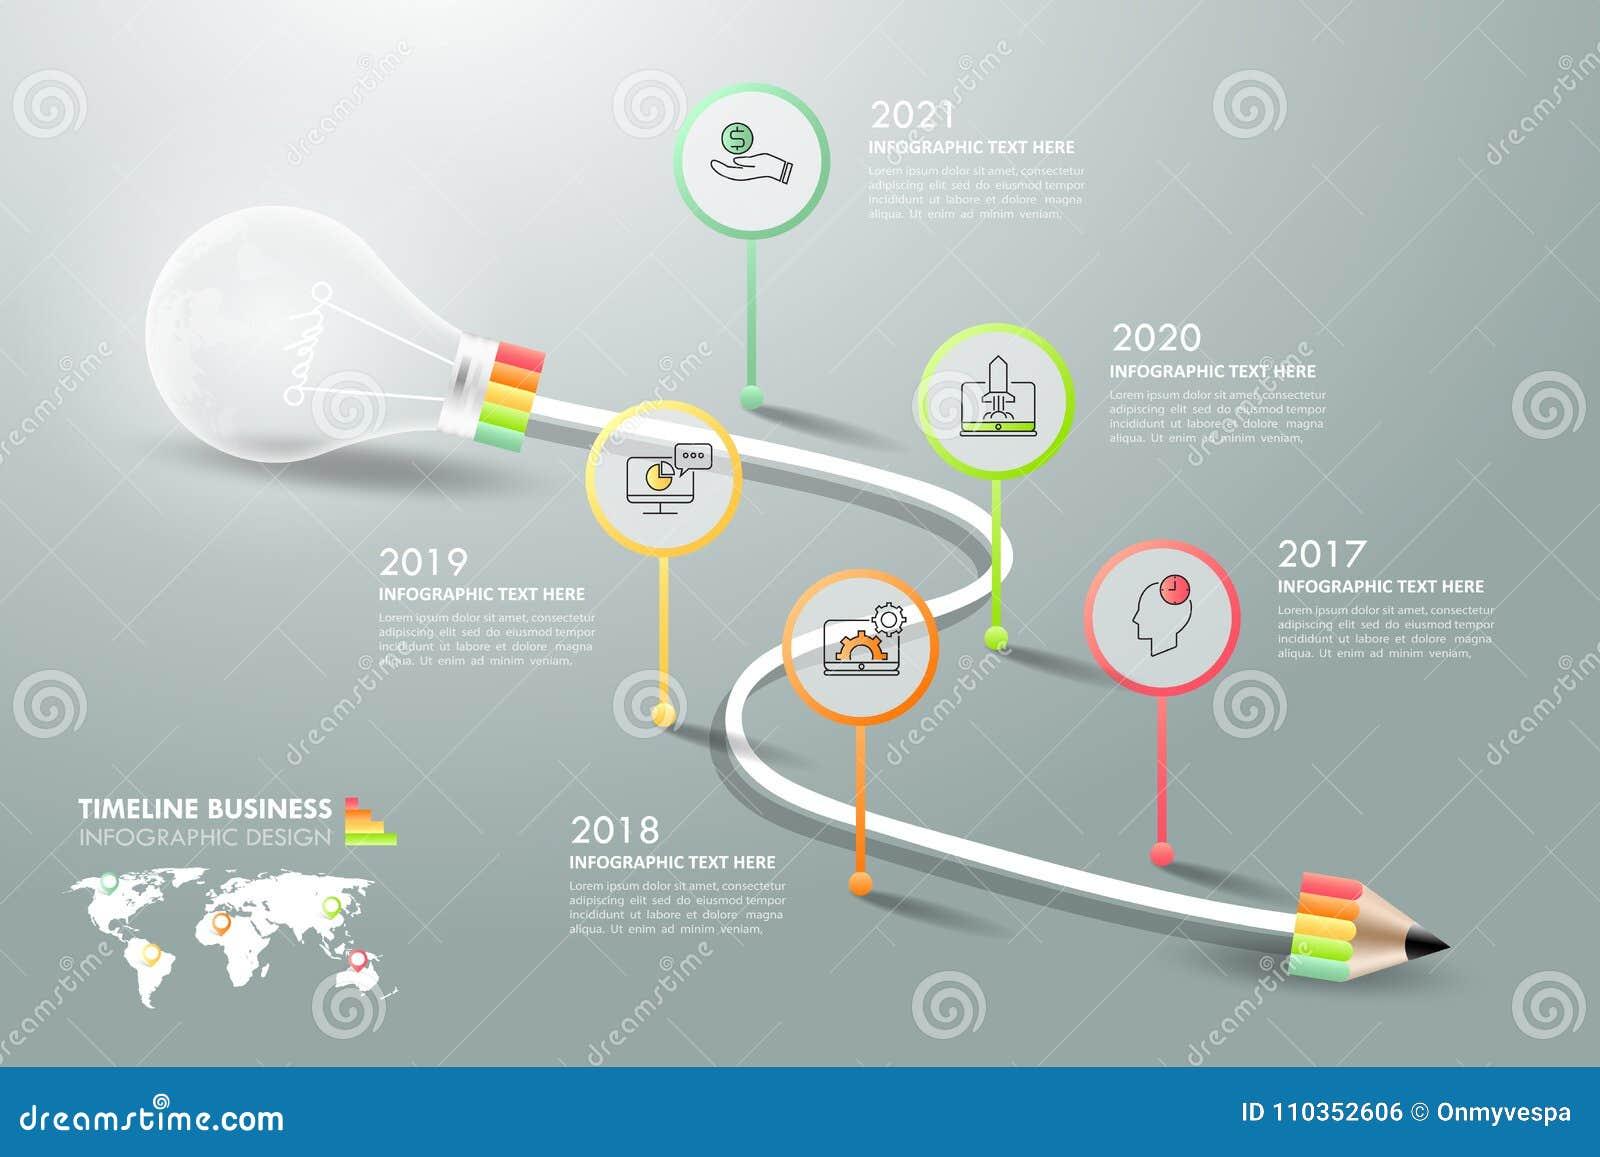 Design Lightbulb Infographic 5 Options Stock Vector Illustration Diagram Of Incandescent Light Bulb